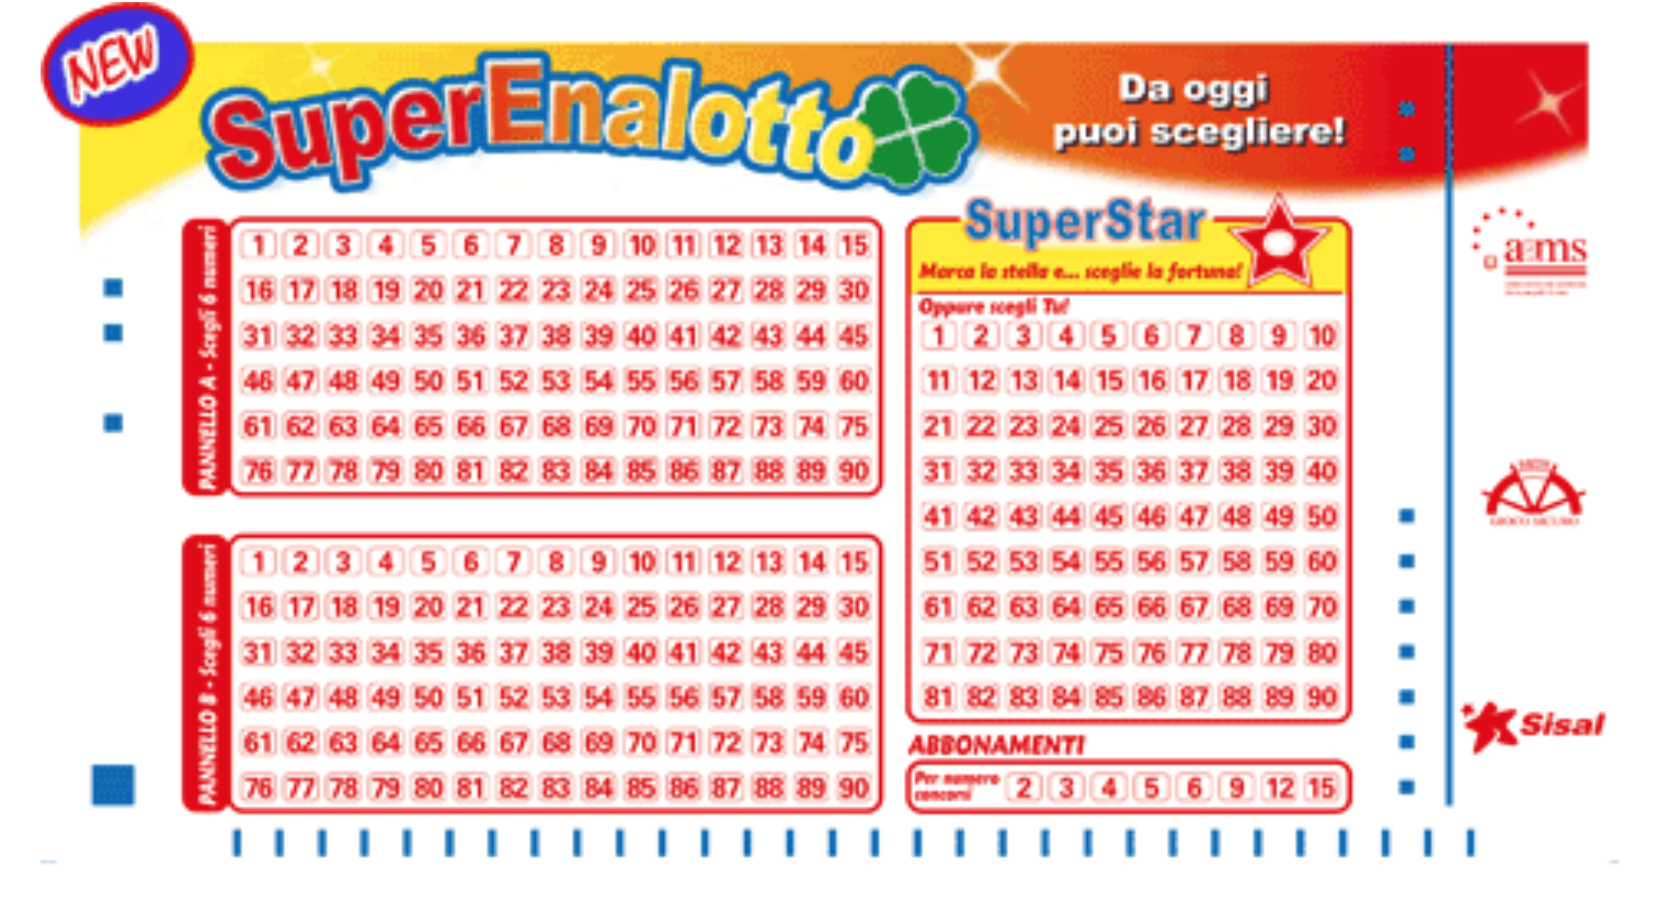 Italiensk superenalottolotteri | italiensk lotteri | spill online